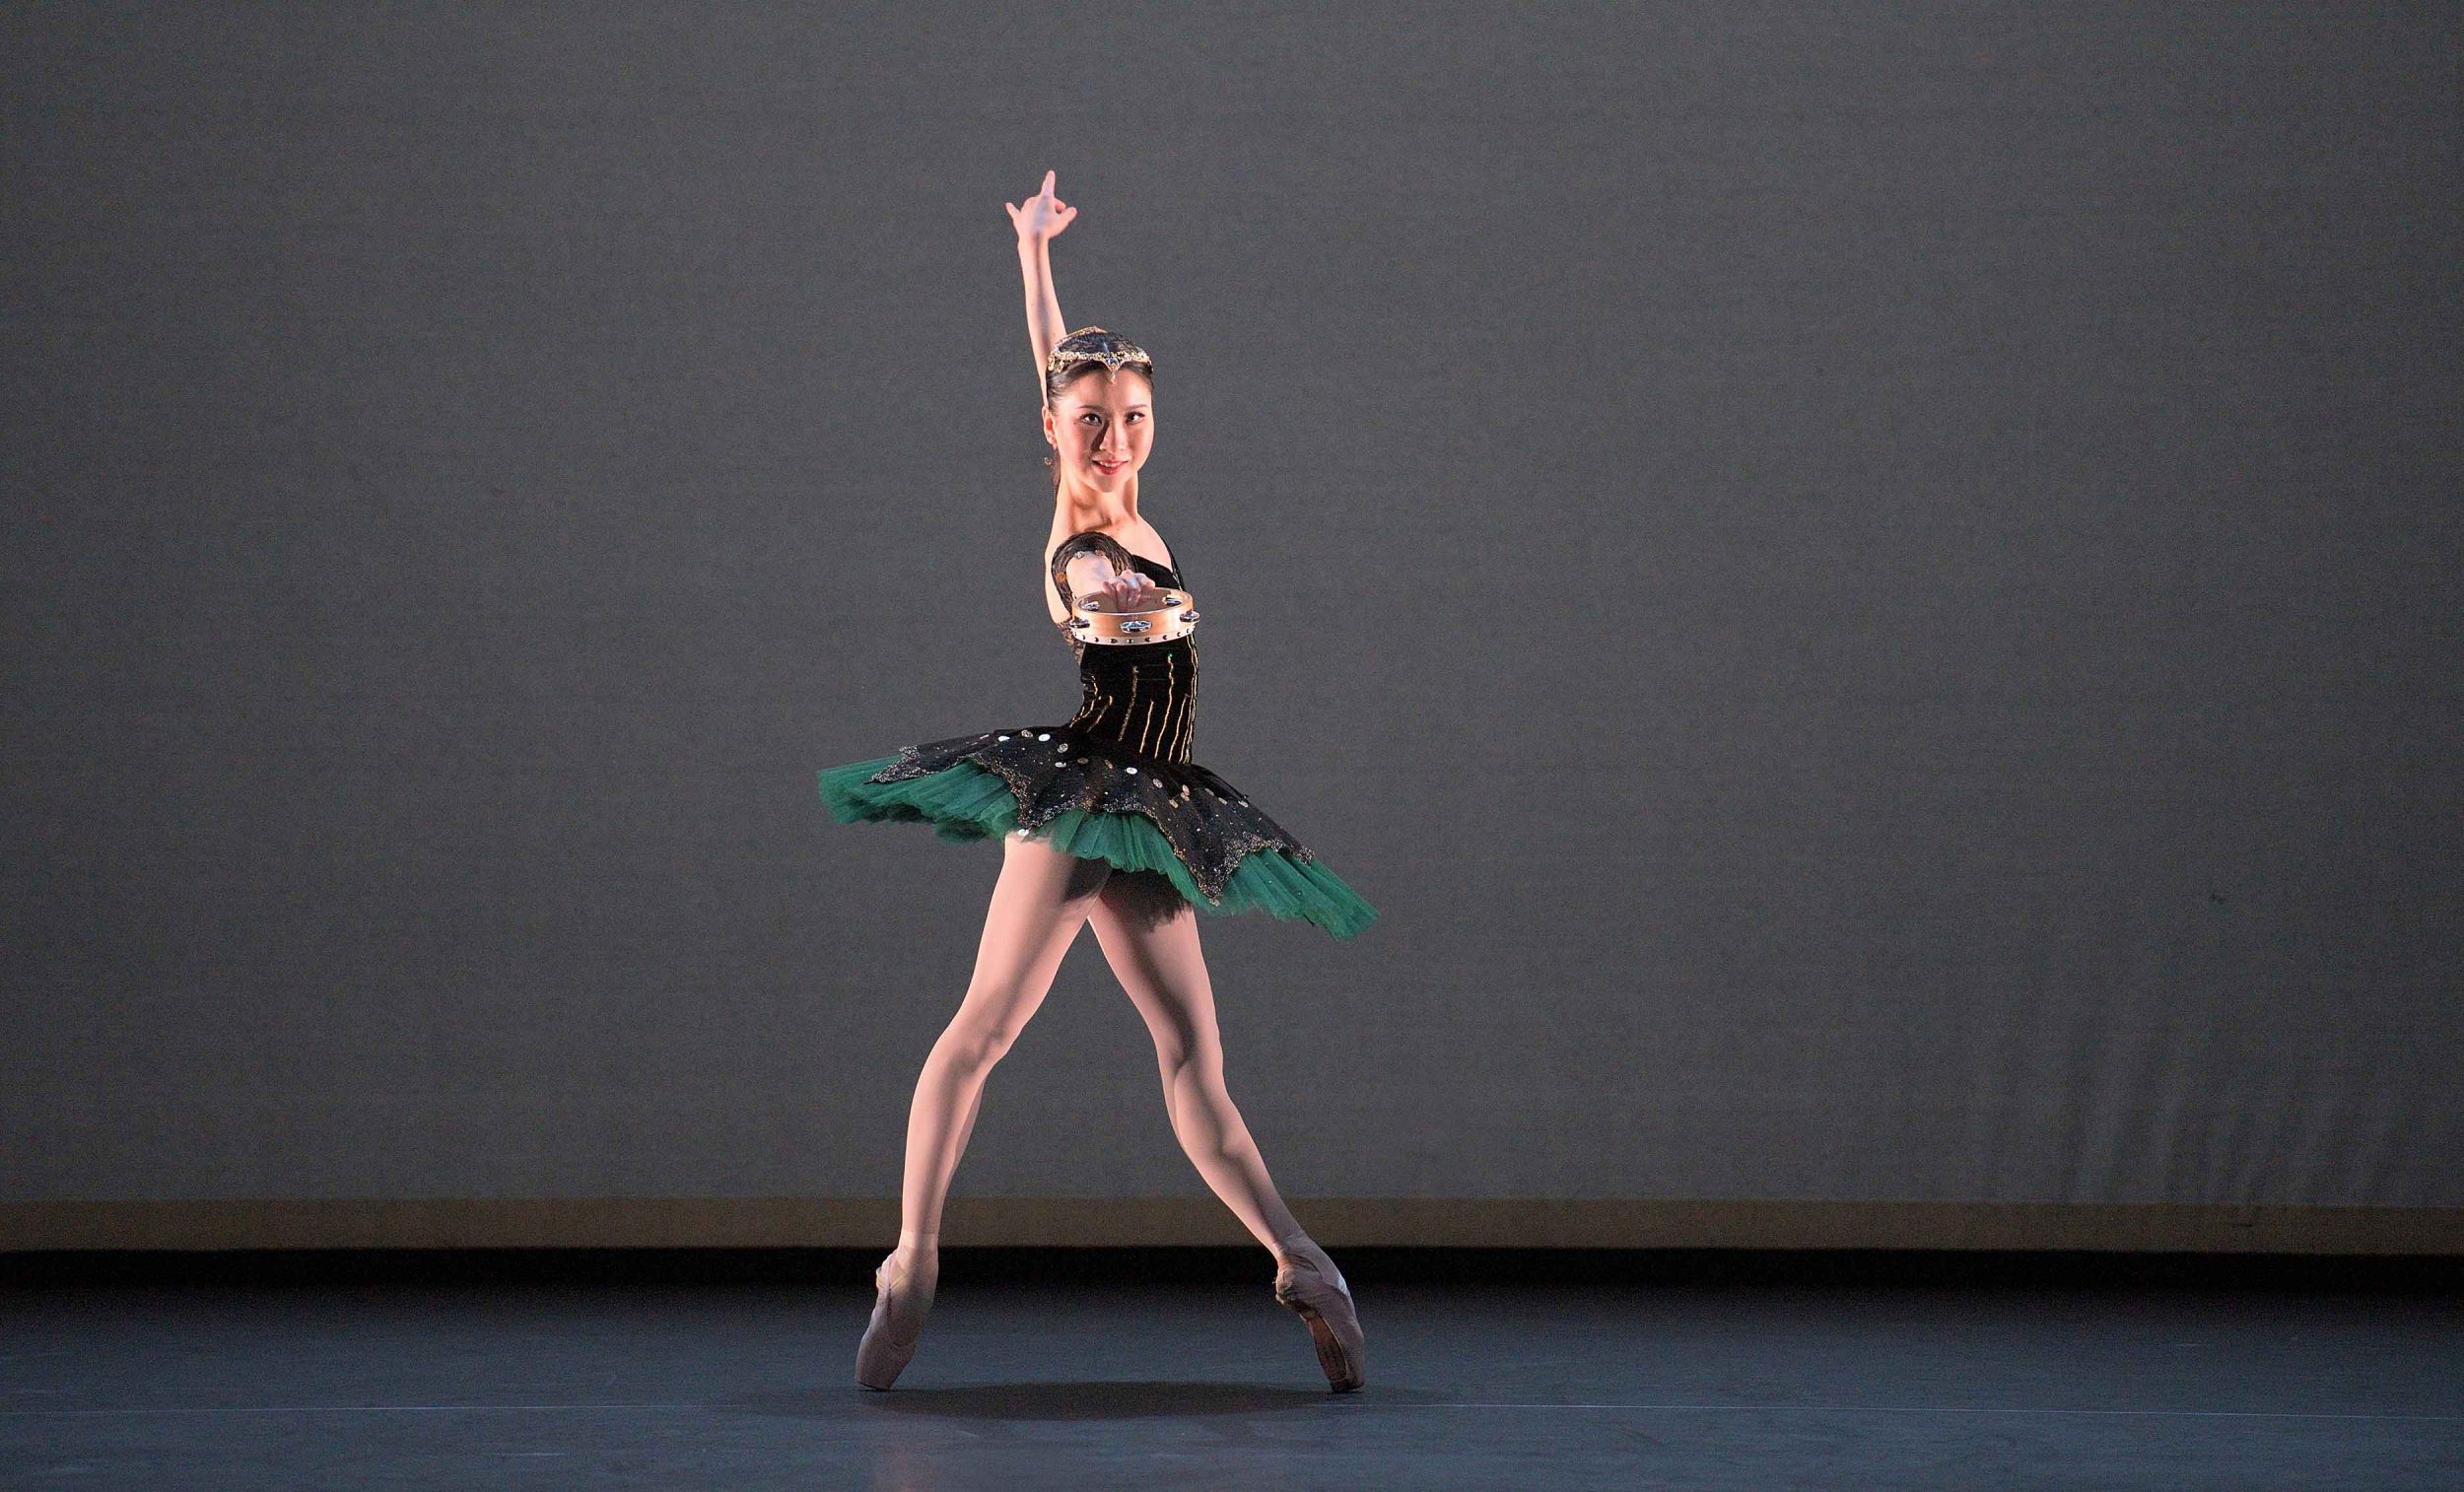 Rina-Kanehara-performing-the-Esmeralda-pas-de-deux-©-Laurent-Liotardo-(2)